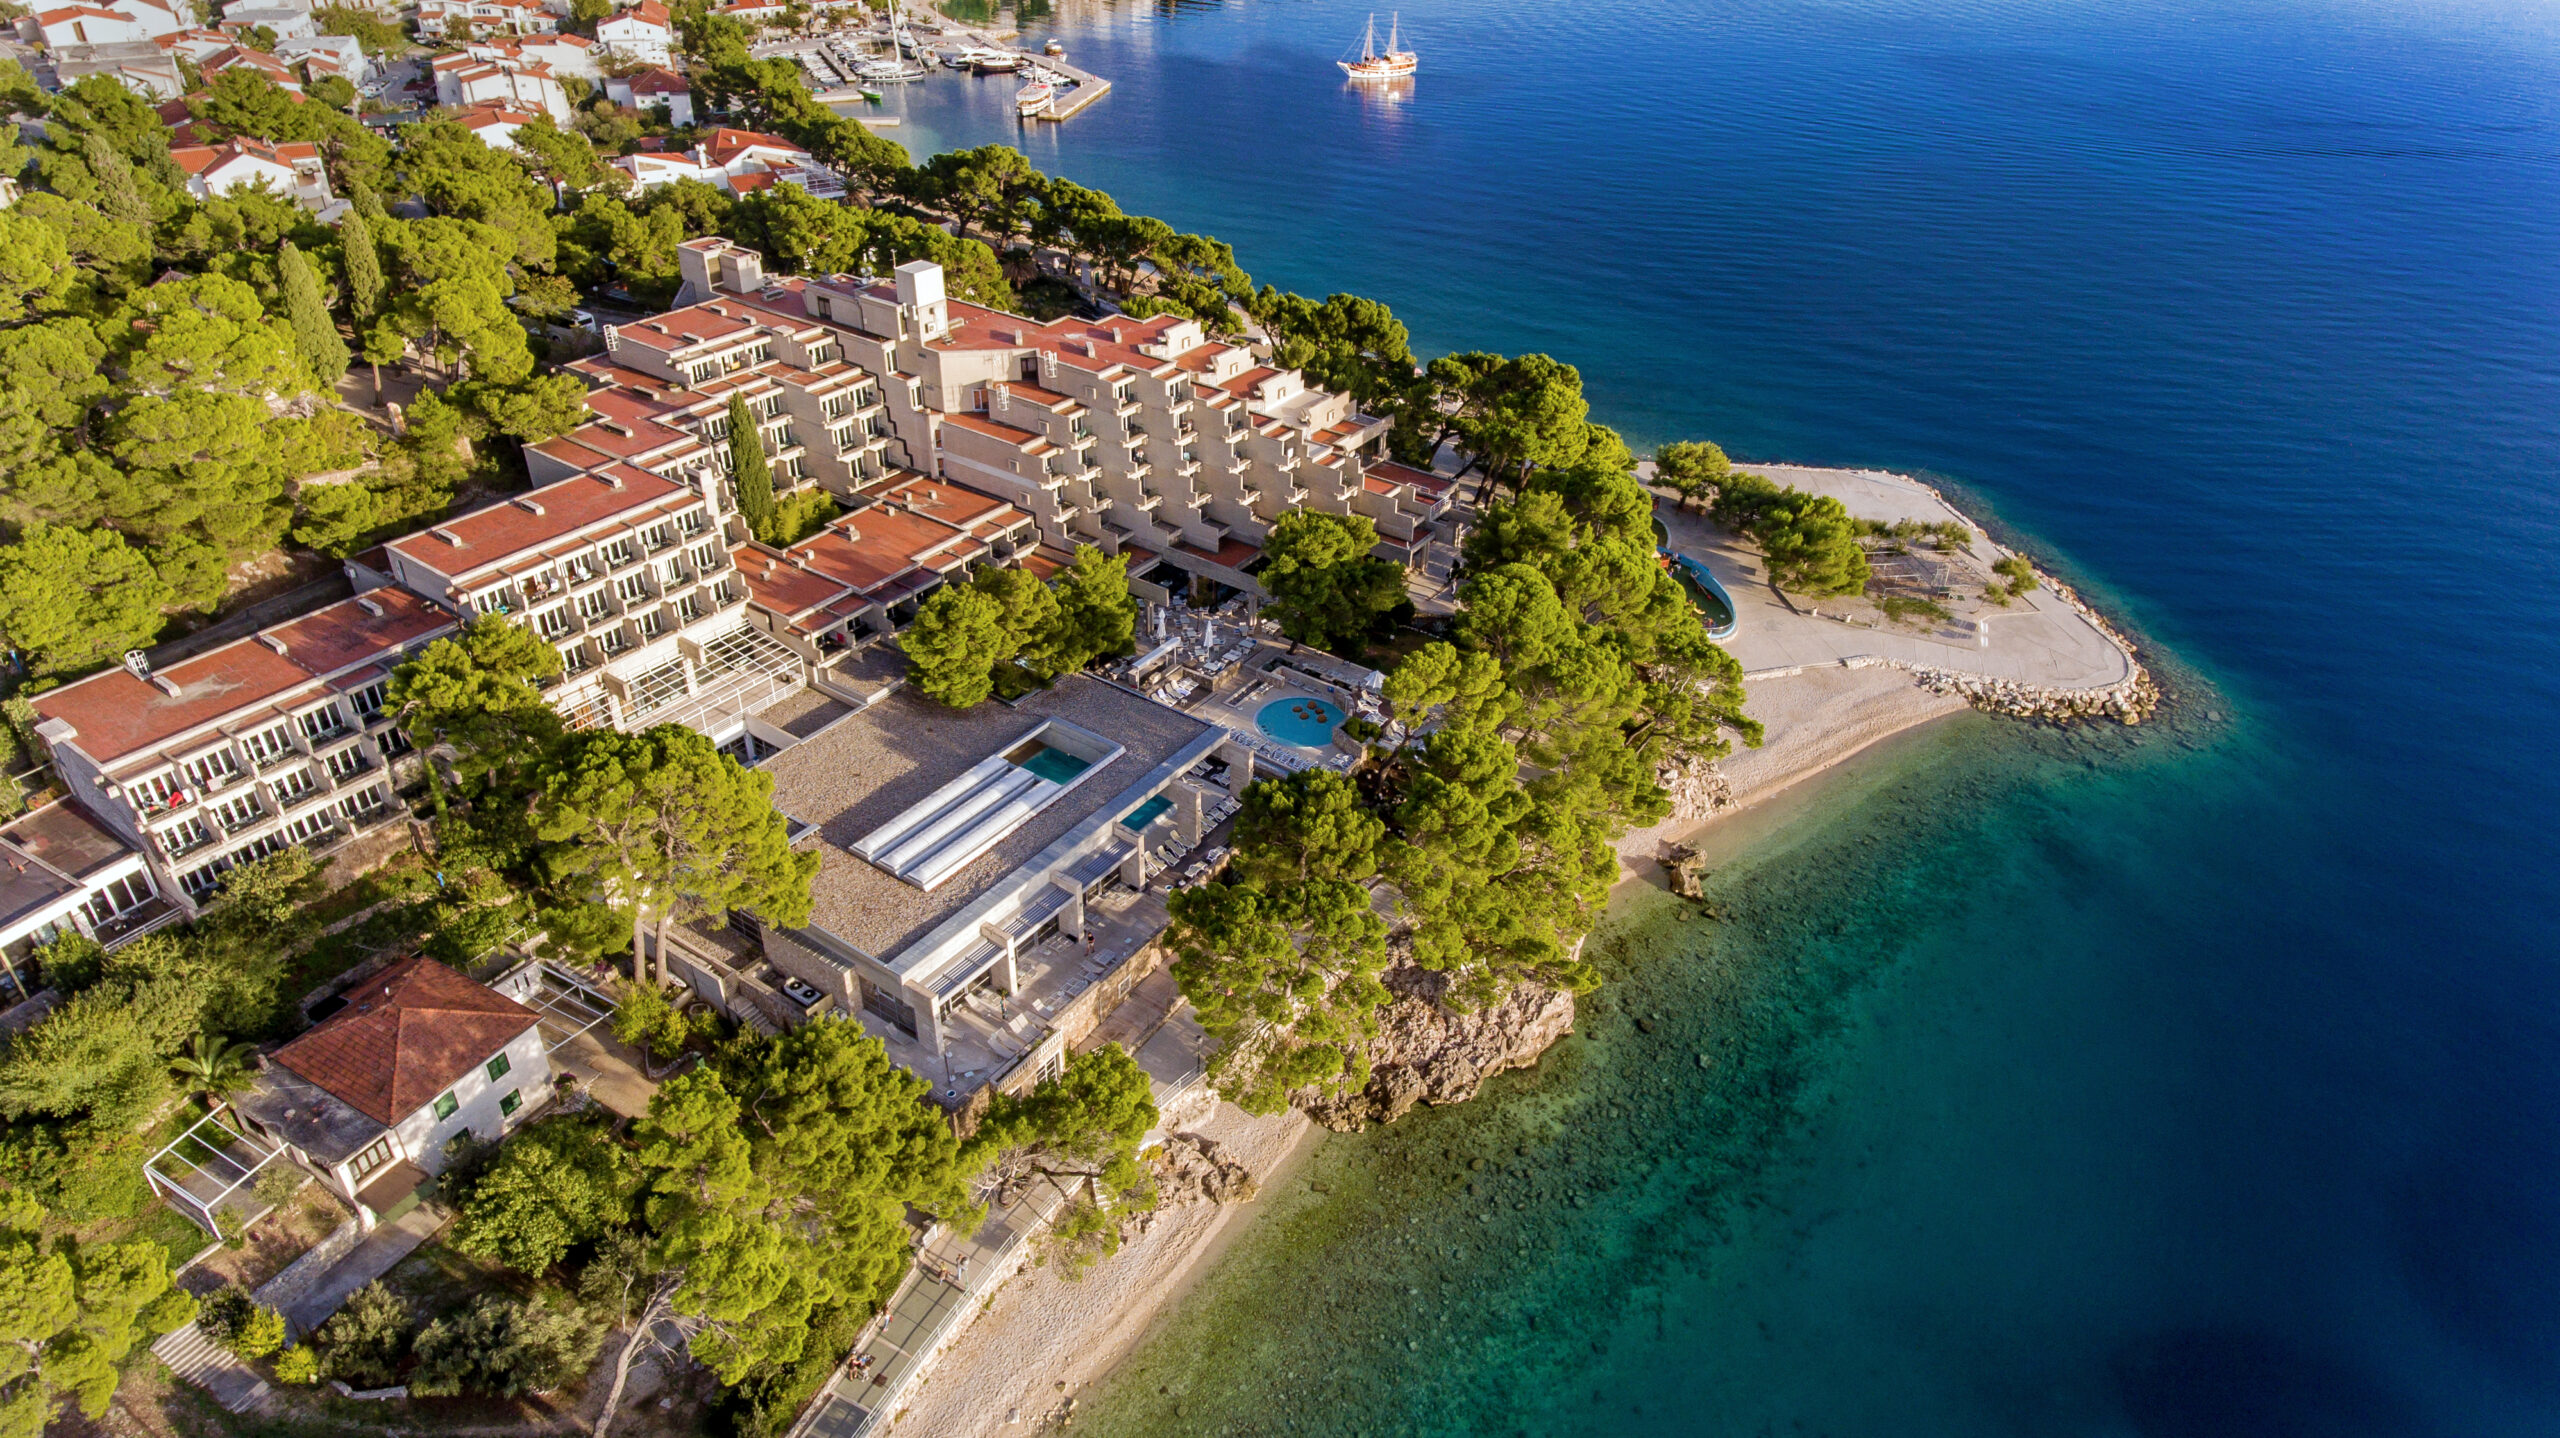 Bluesun Hotel Soline, Brela, Croatia (7)